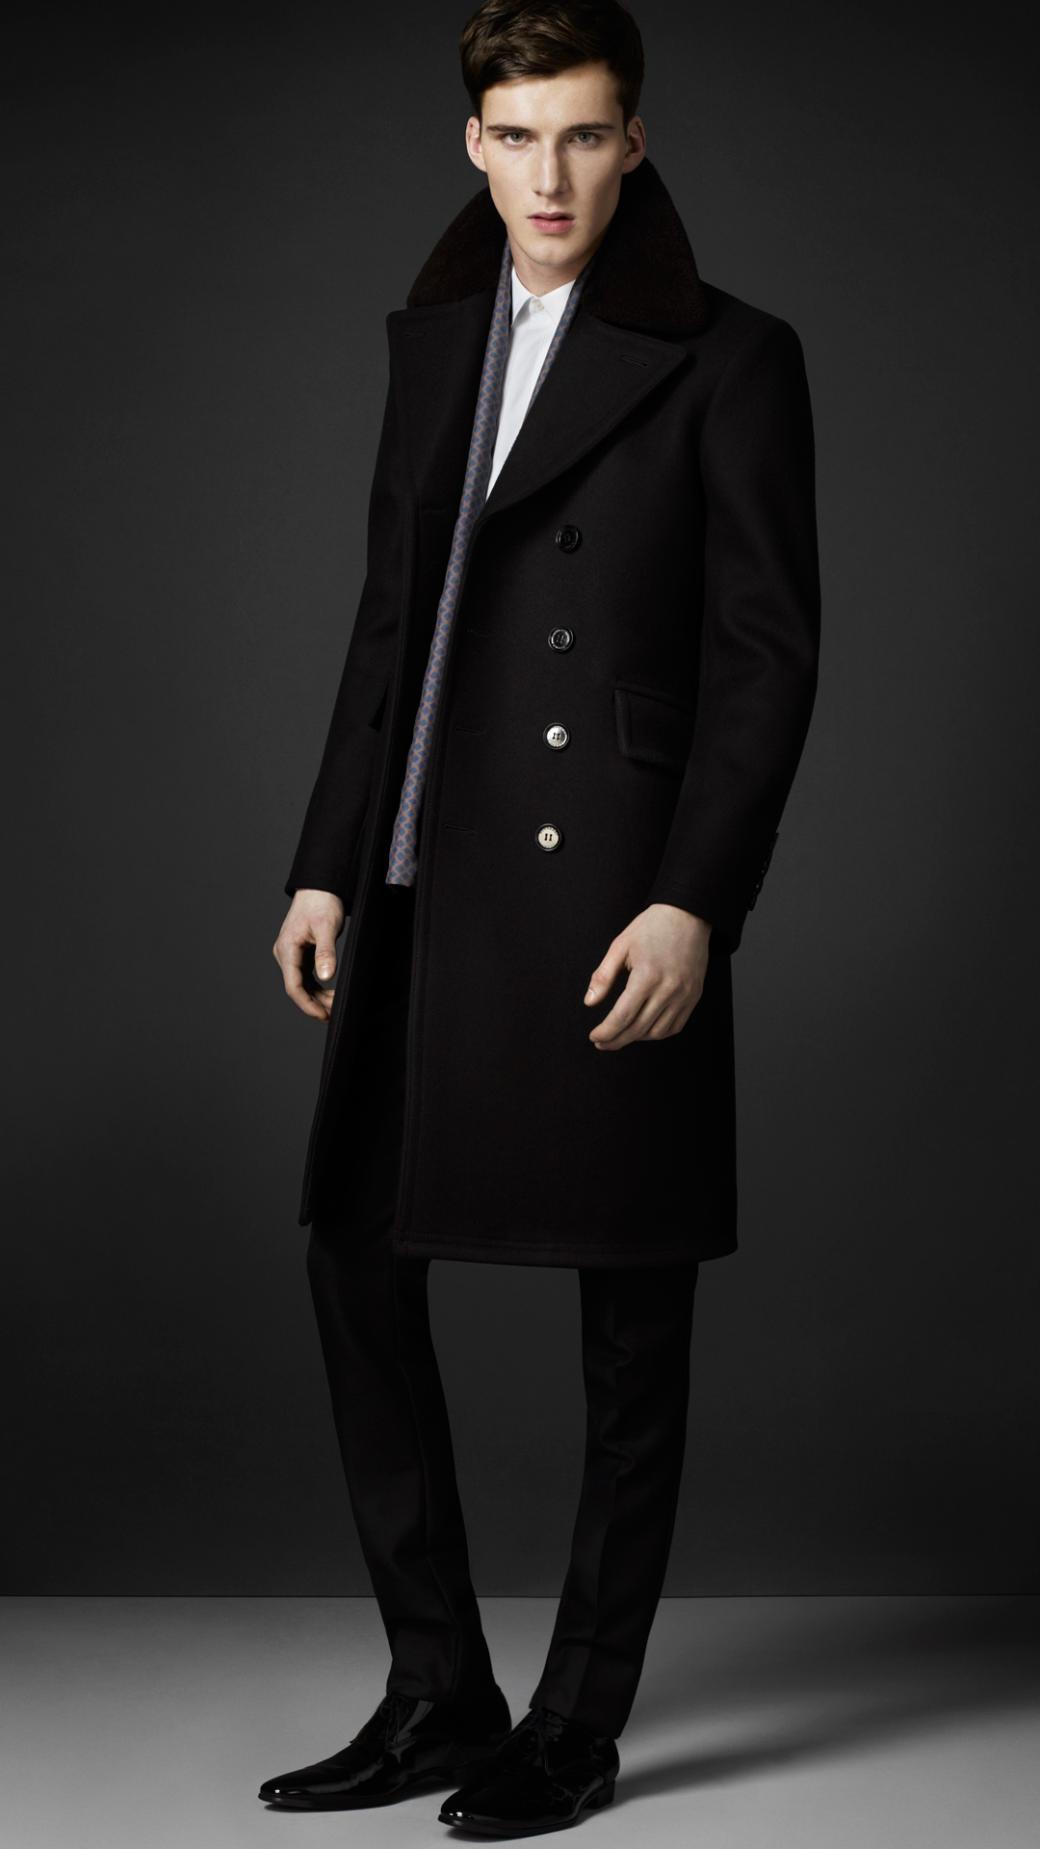 c03e0945530 Lyst - Burberry Virgin Wool Chesterfield Coat in Black for Men